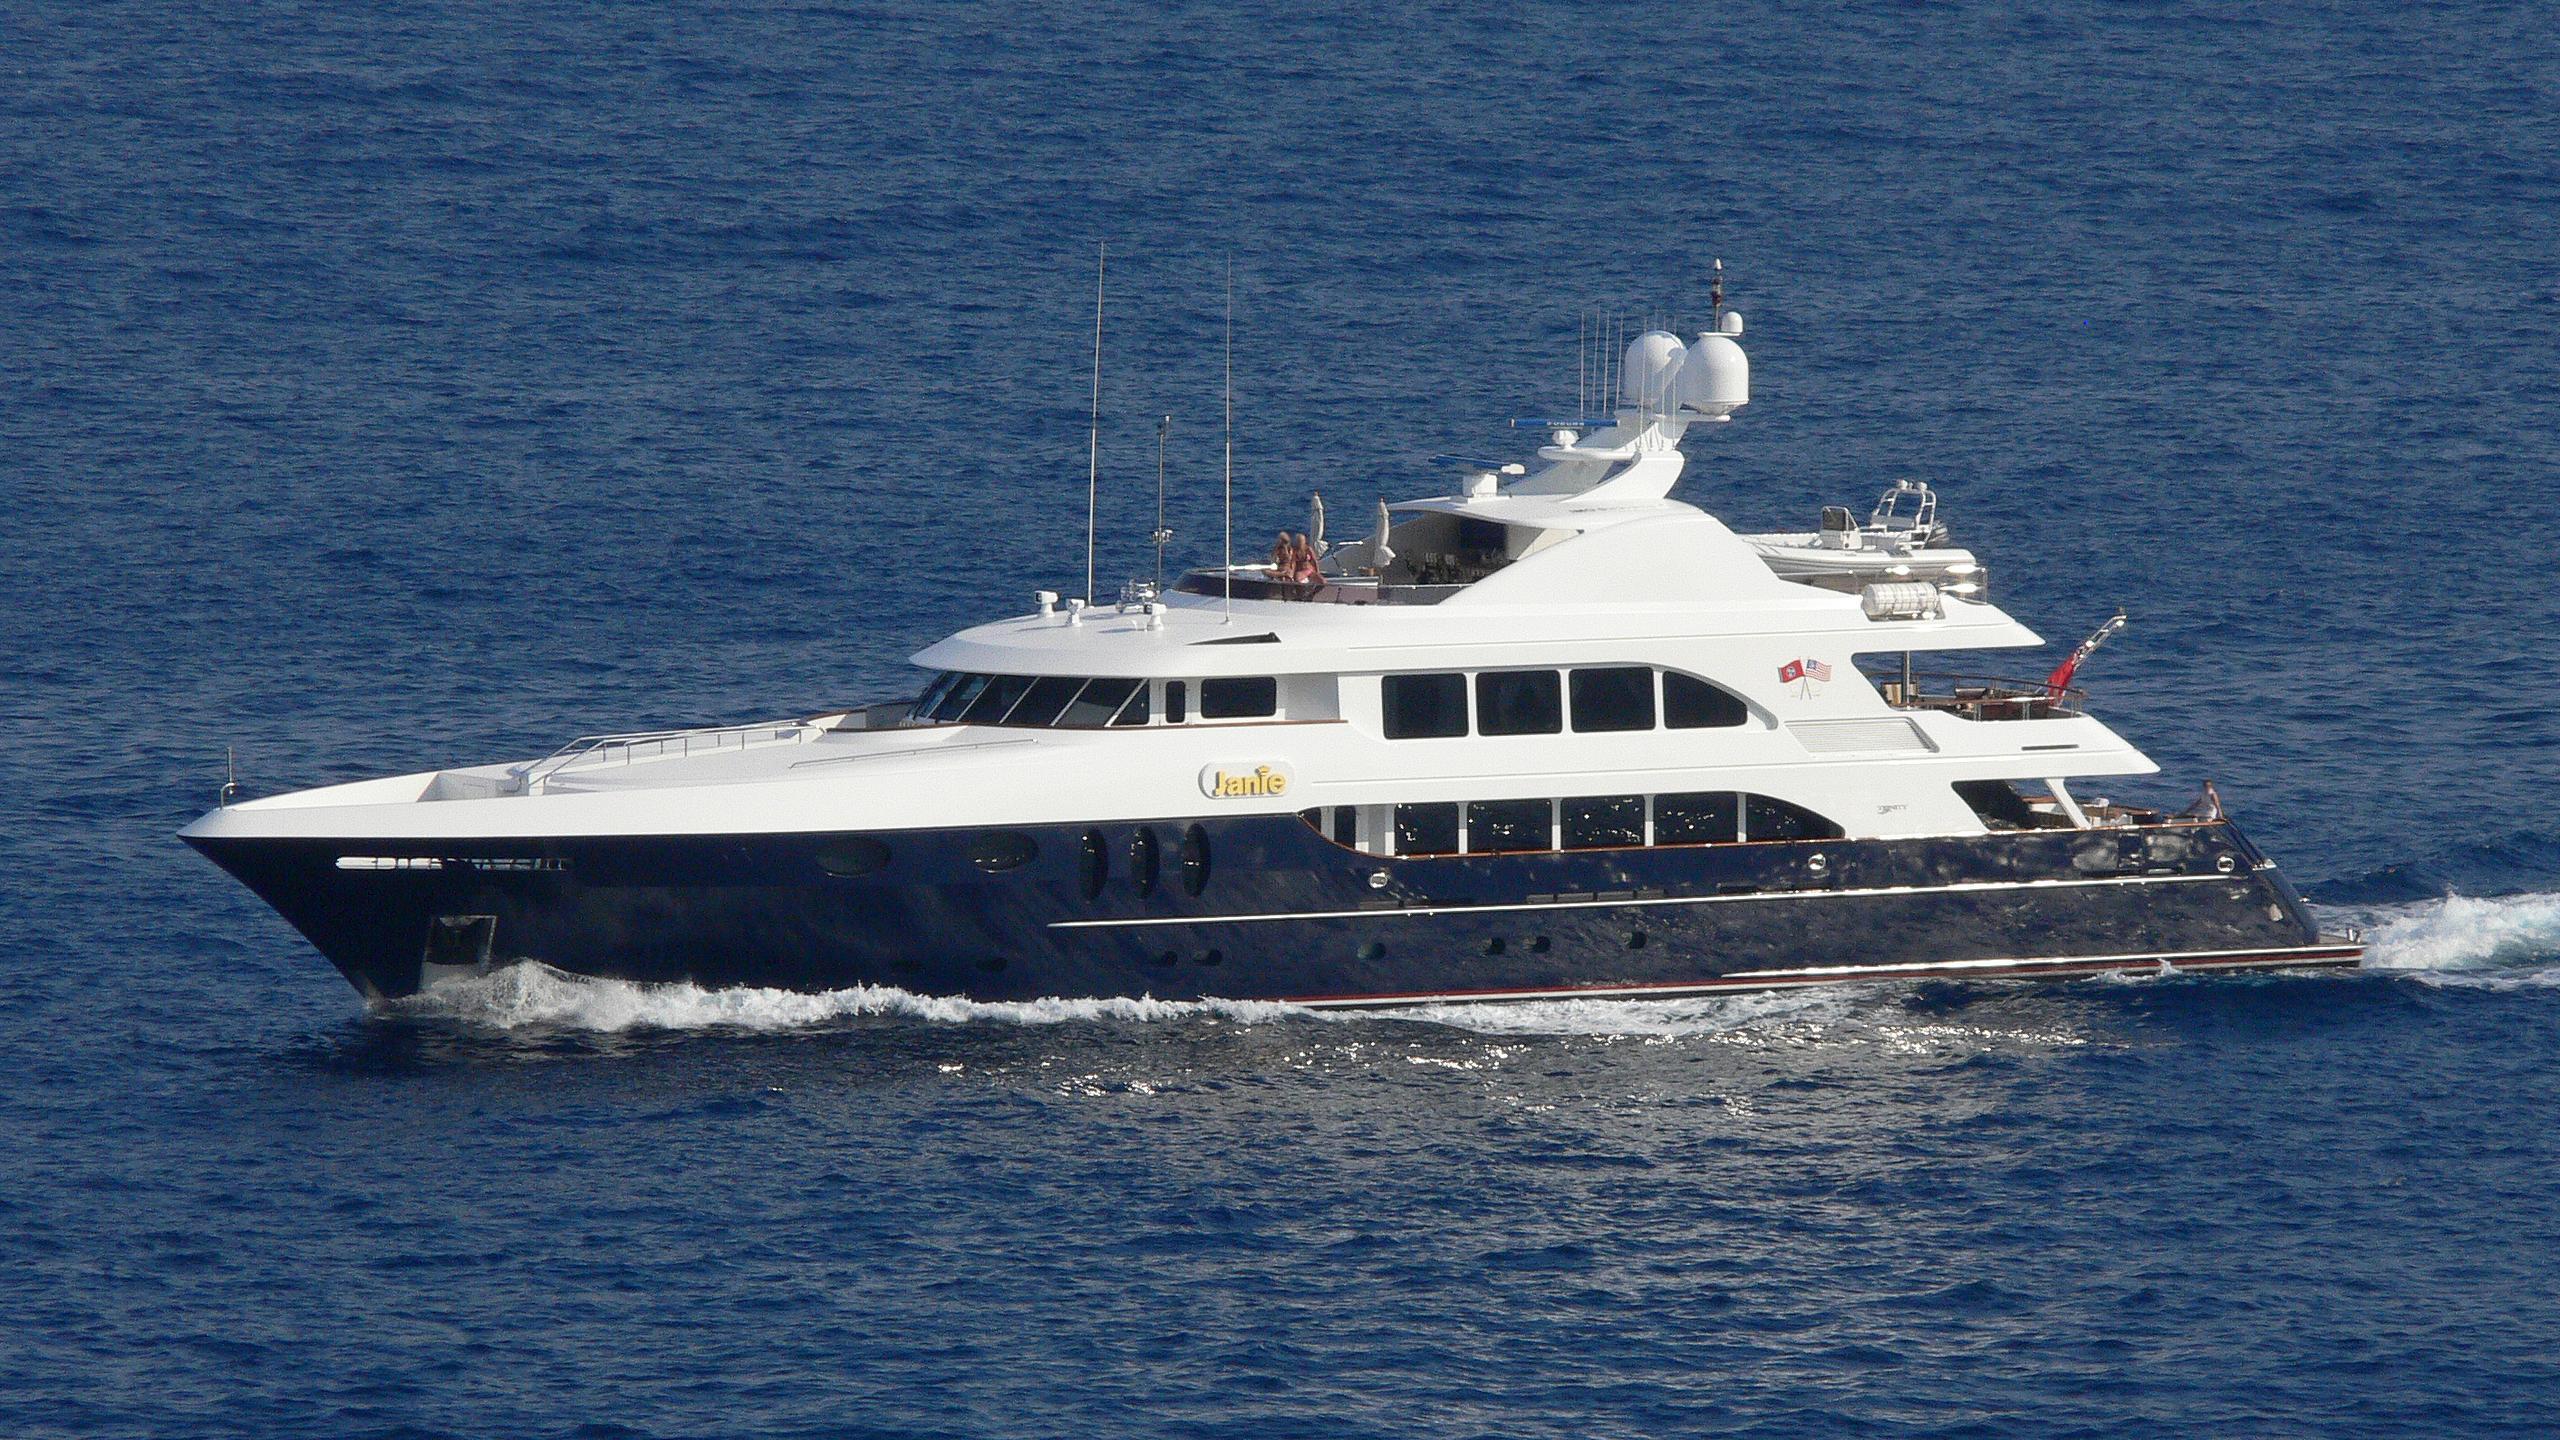 alessandra cocktails motoryacht trinity yachts 48m 2004 profile